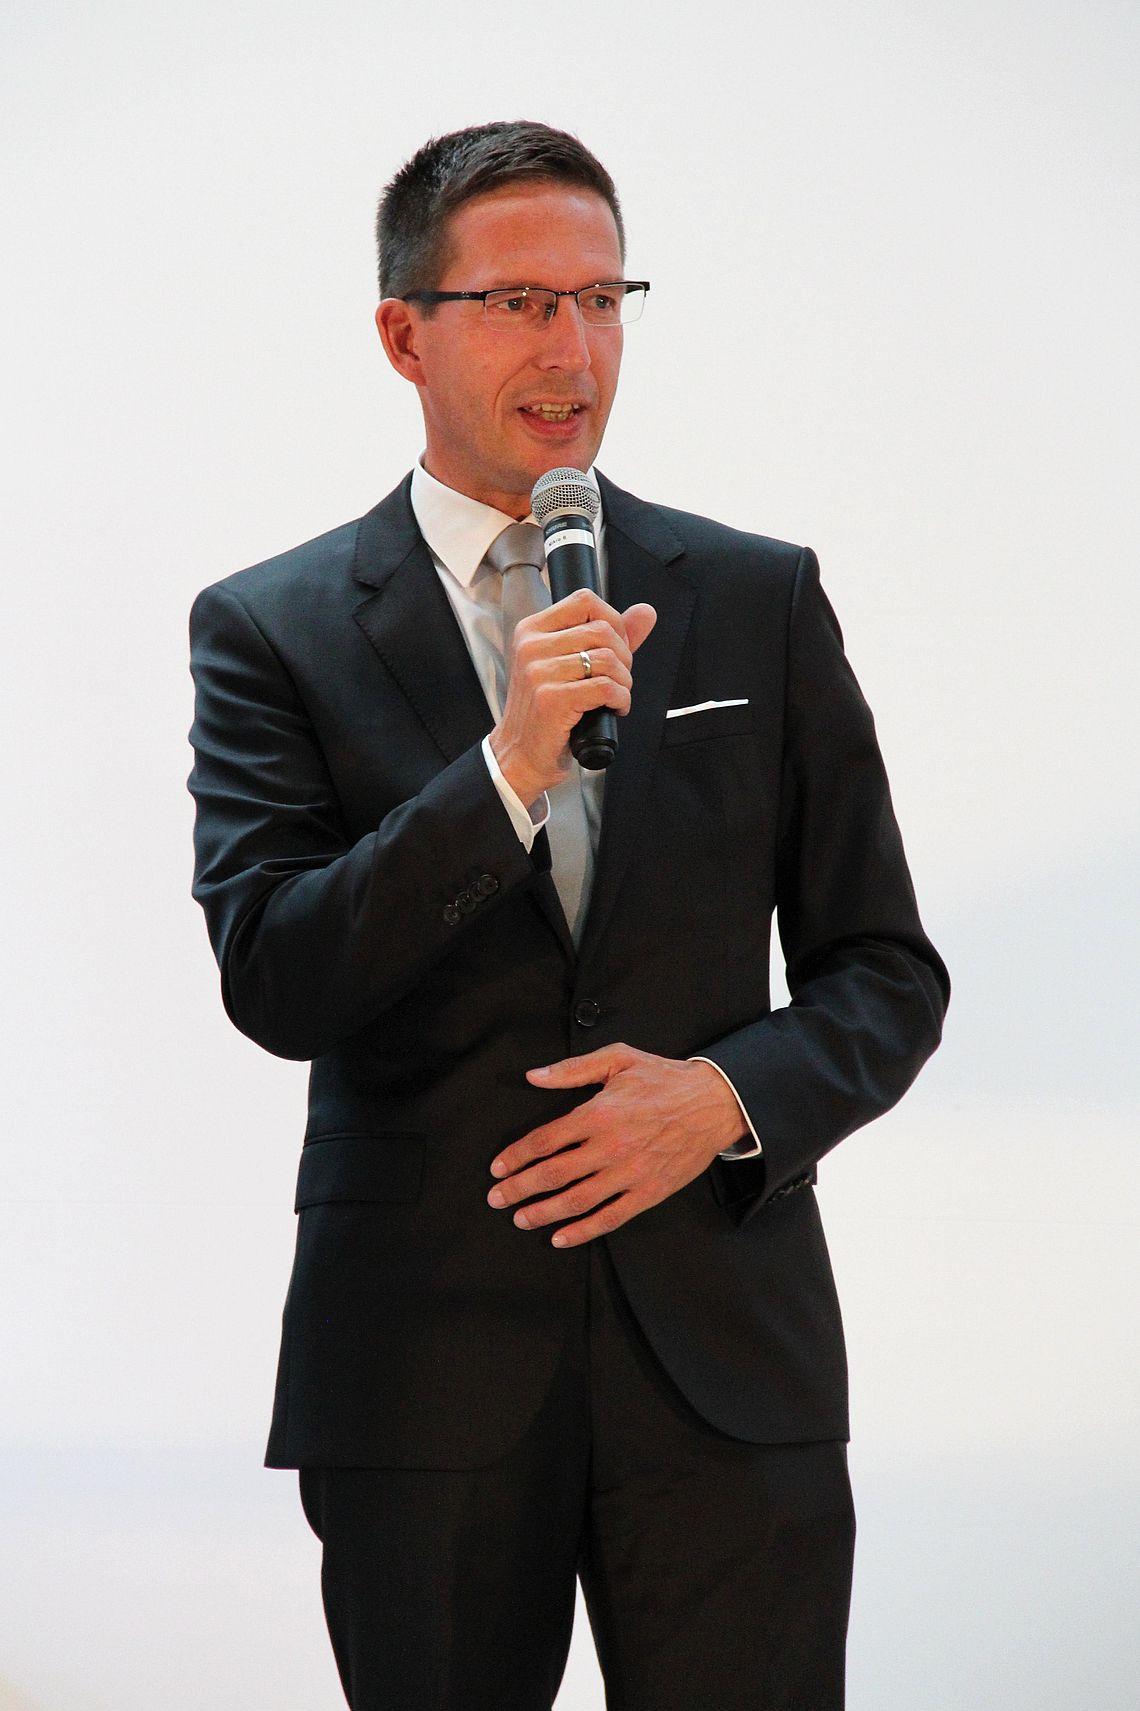 Bürgermeister Michael Abraham